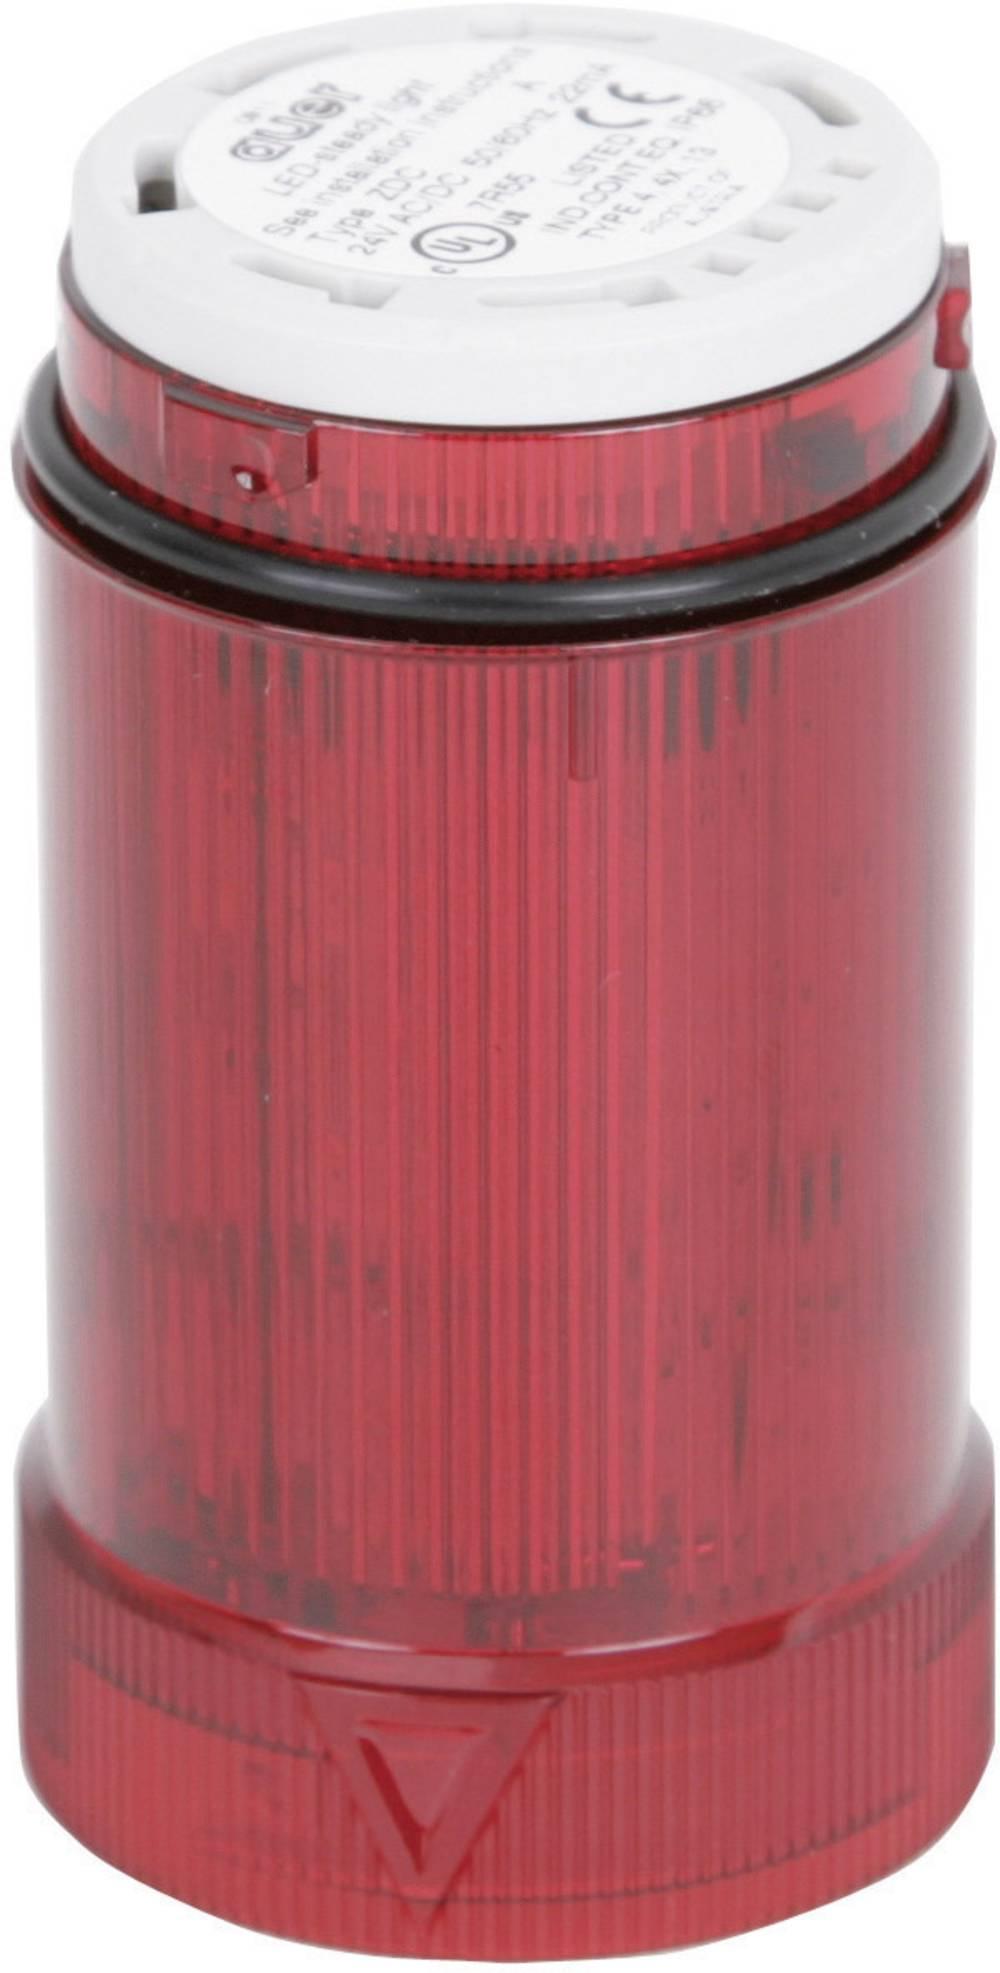 Signalni svetlobni modul Auer Signalgeräte ZDC rdeča neprekinjena luč 230 V/AC